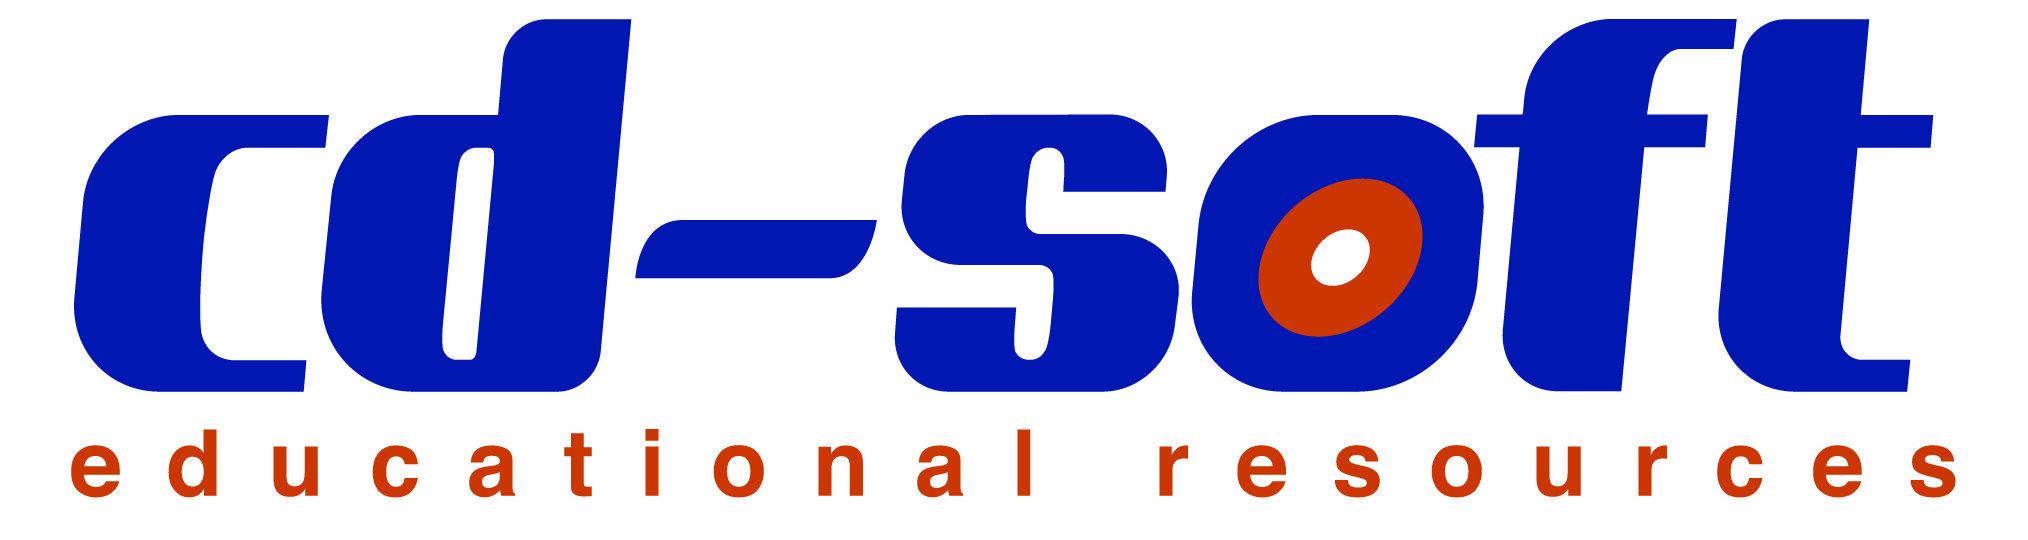 cdsoft logo educational resources Hi Res - Paul Smargiassi.jpg